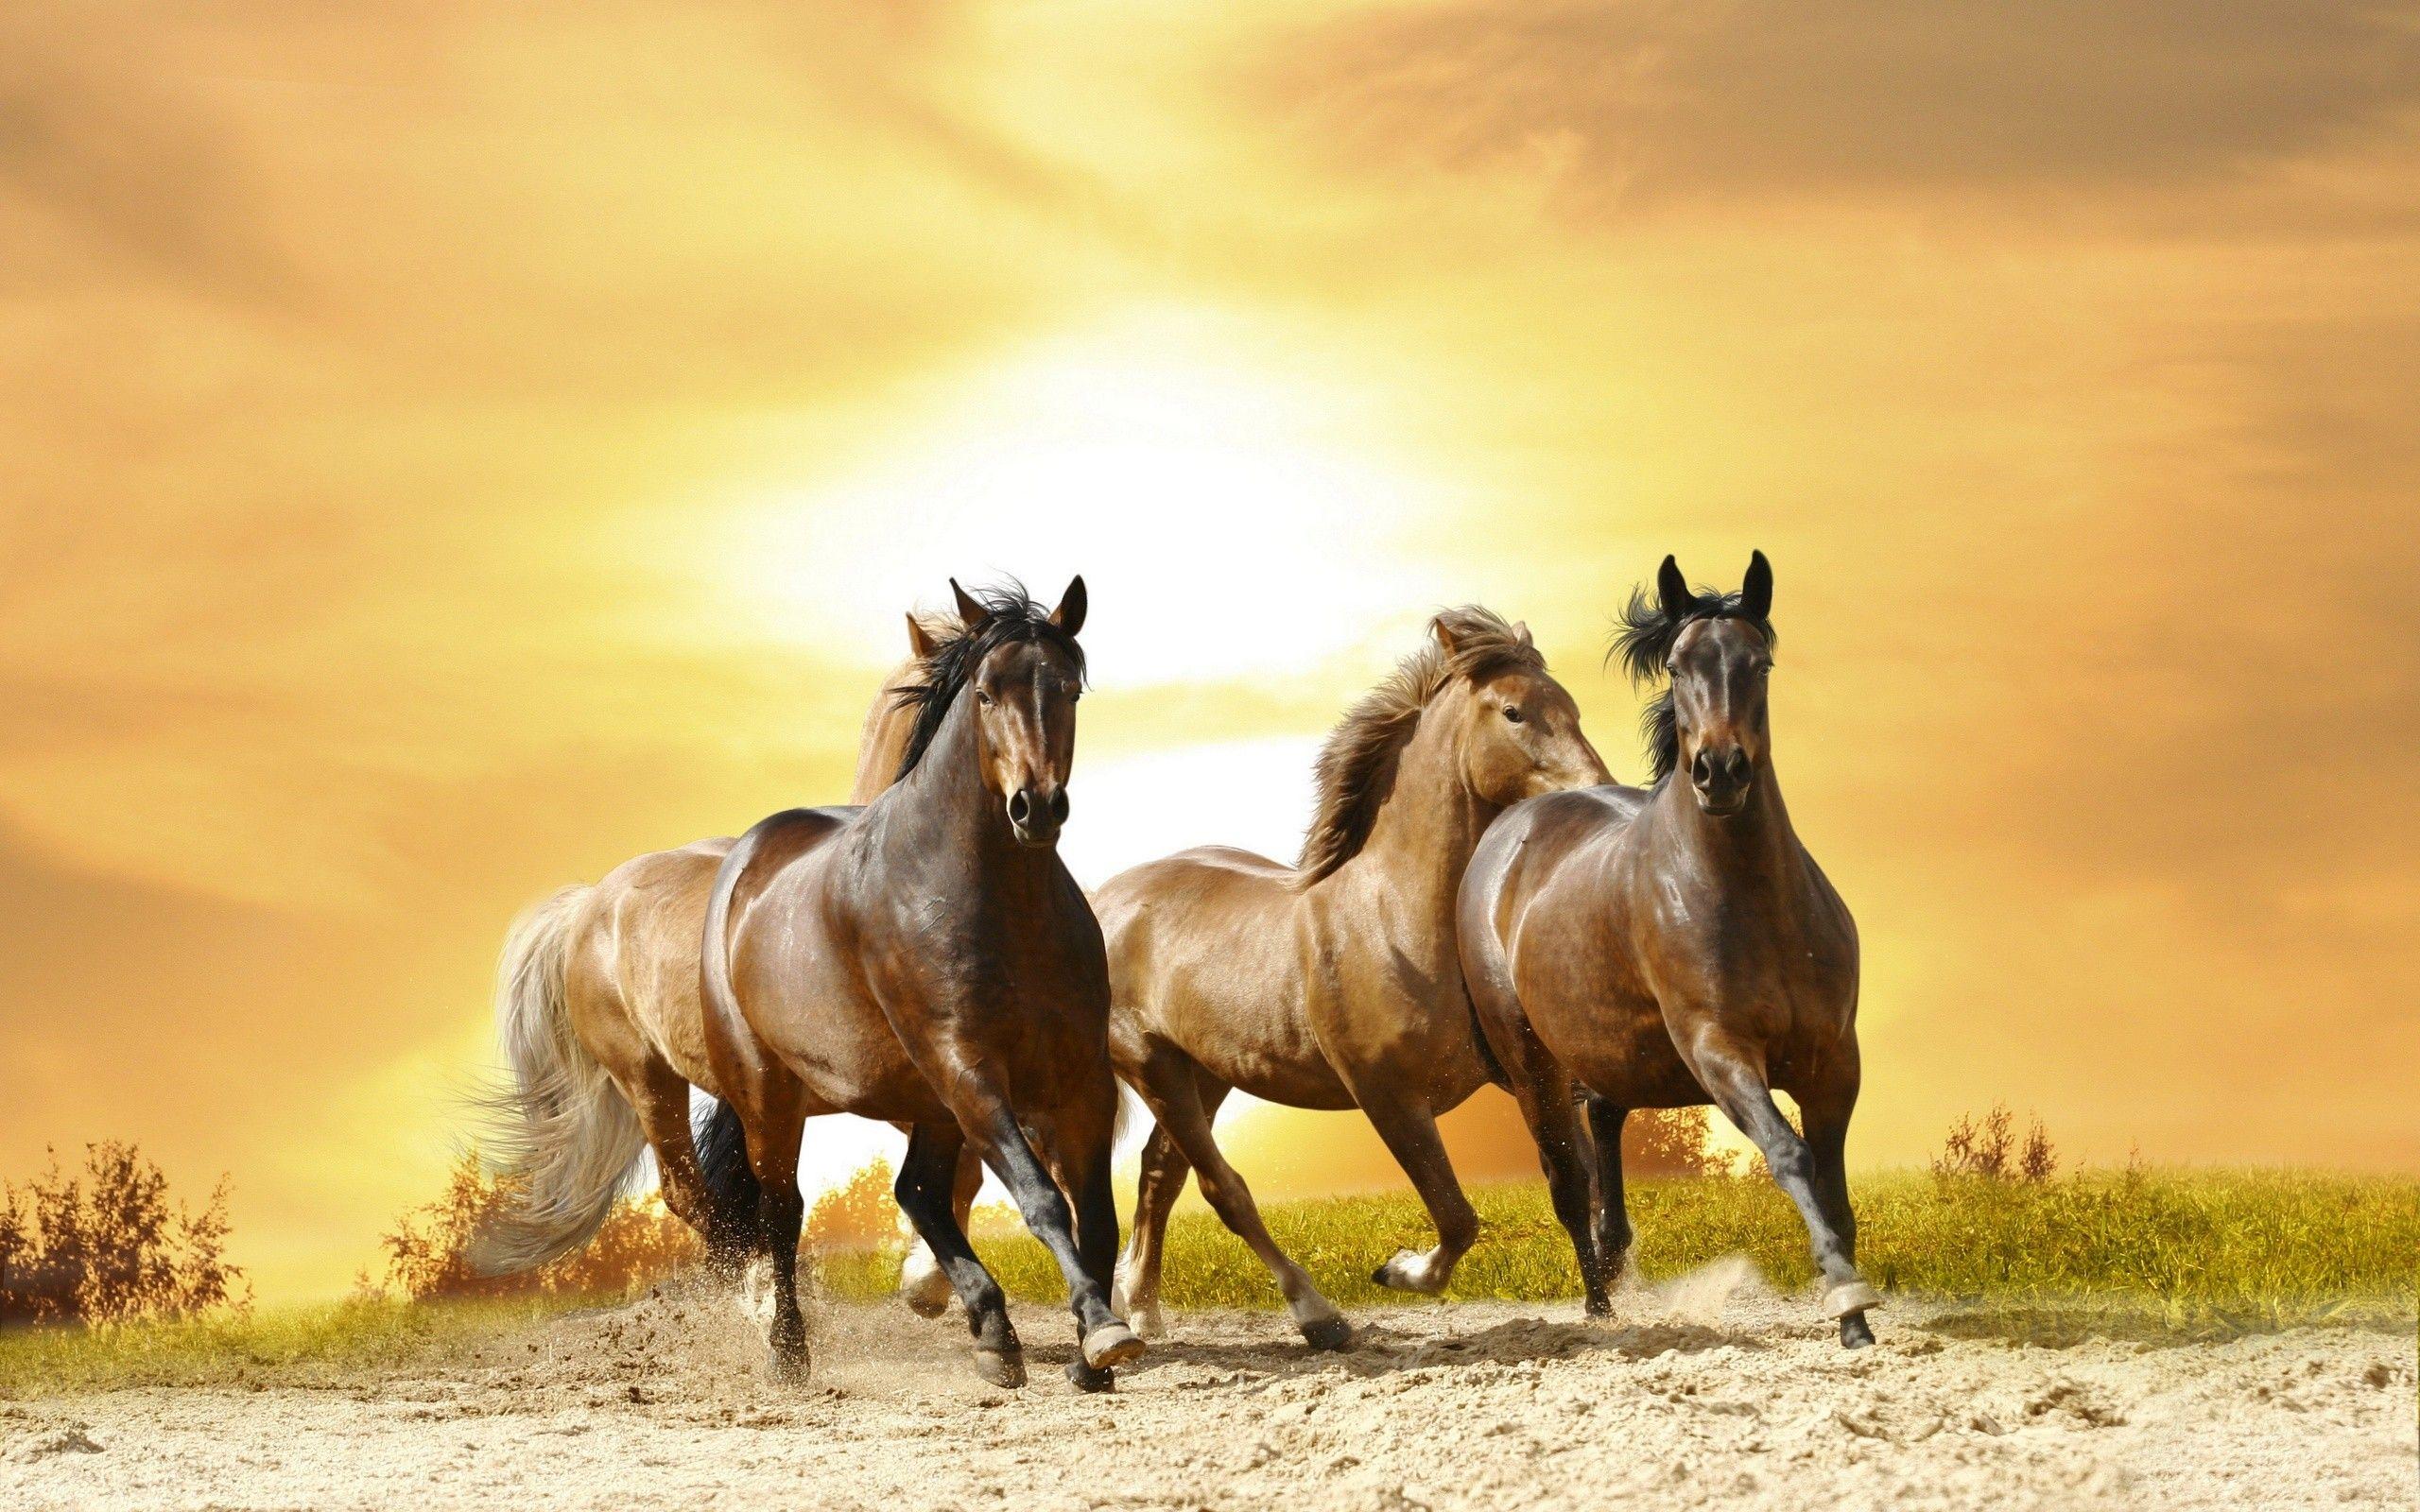 Beautiful Wallpaper Horse Yellow - 28b34f0ff898437167f92ce4aa7e49f9  Graphic_644964.jpg